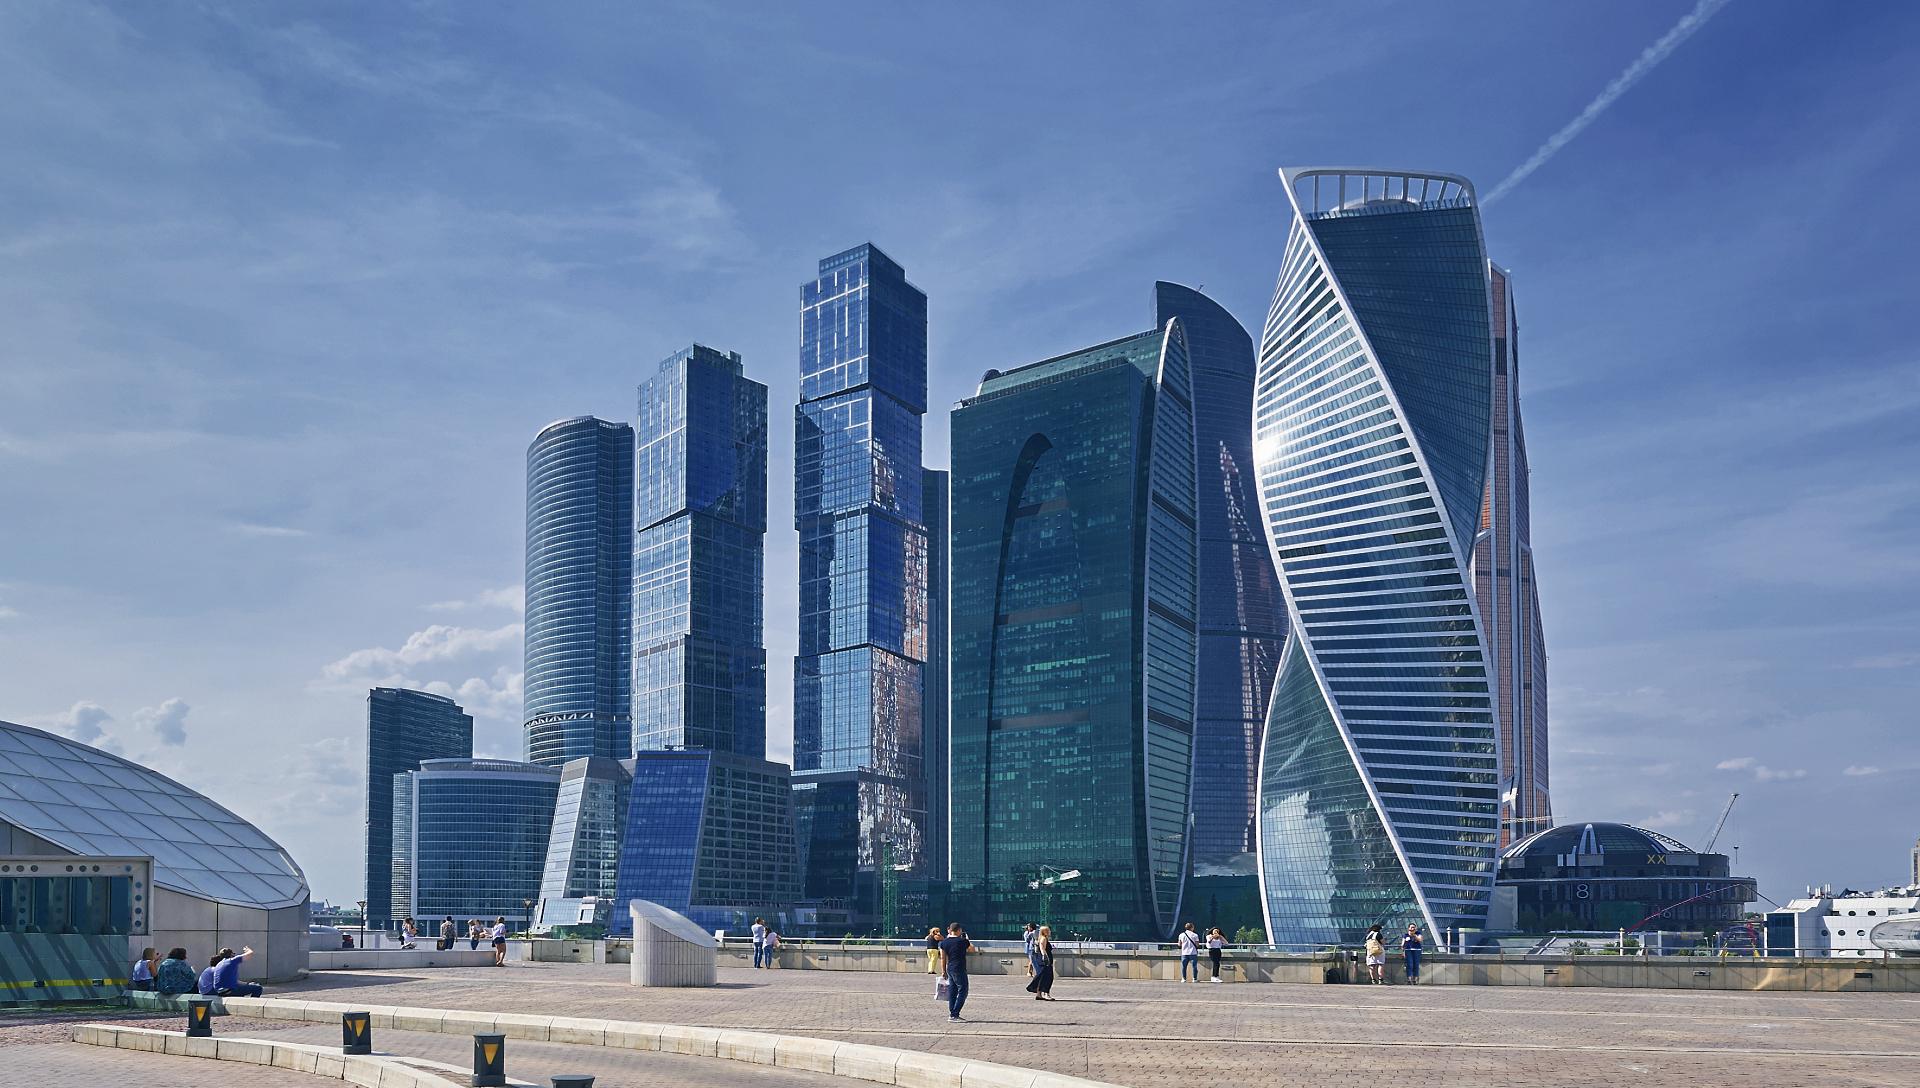 Фото:Mikhail Leonov/shutterstock